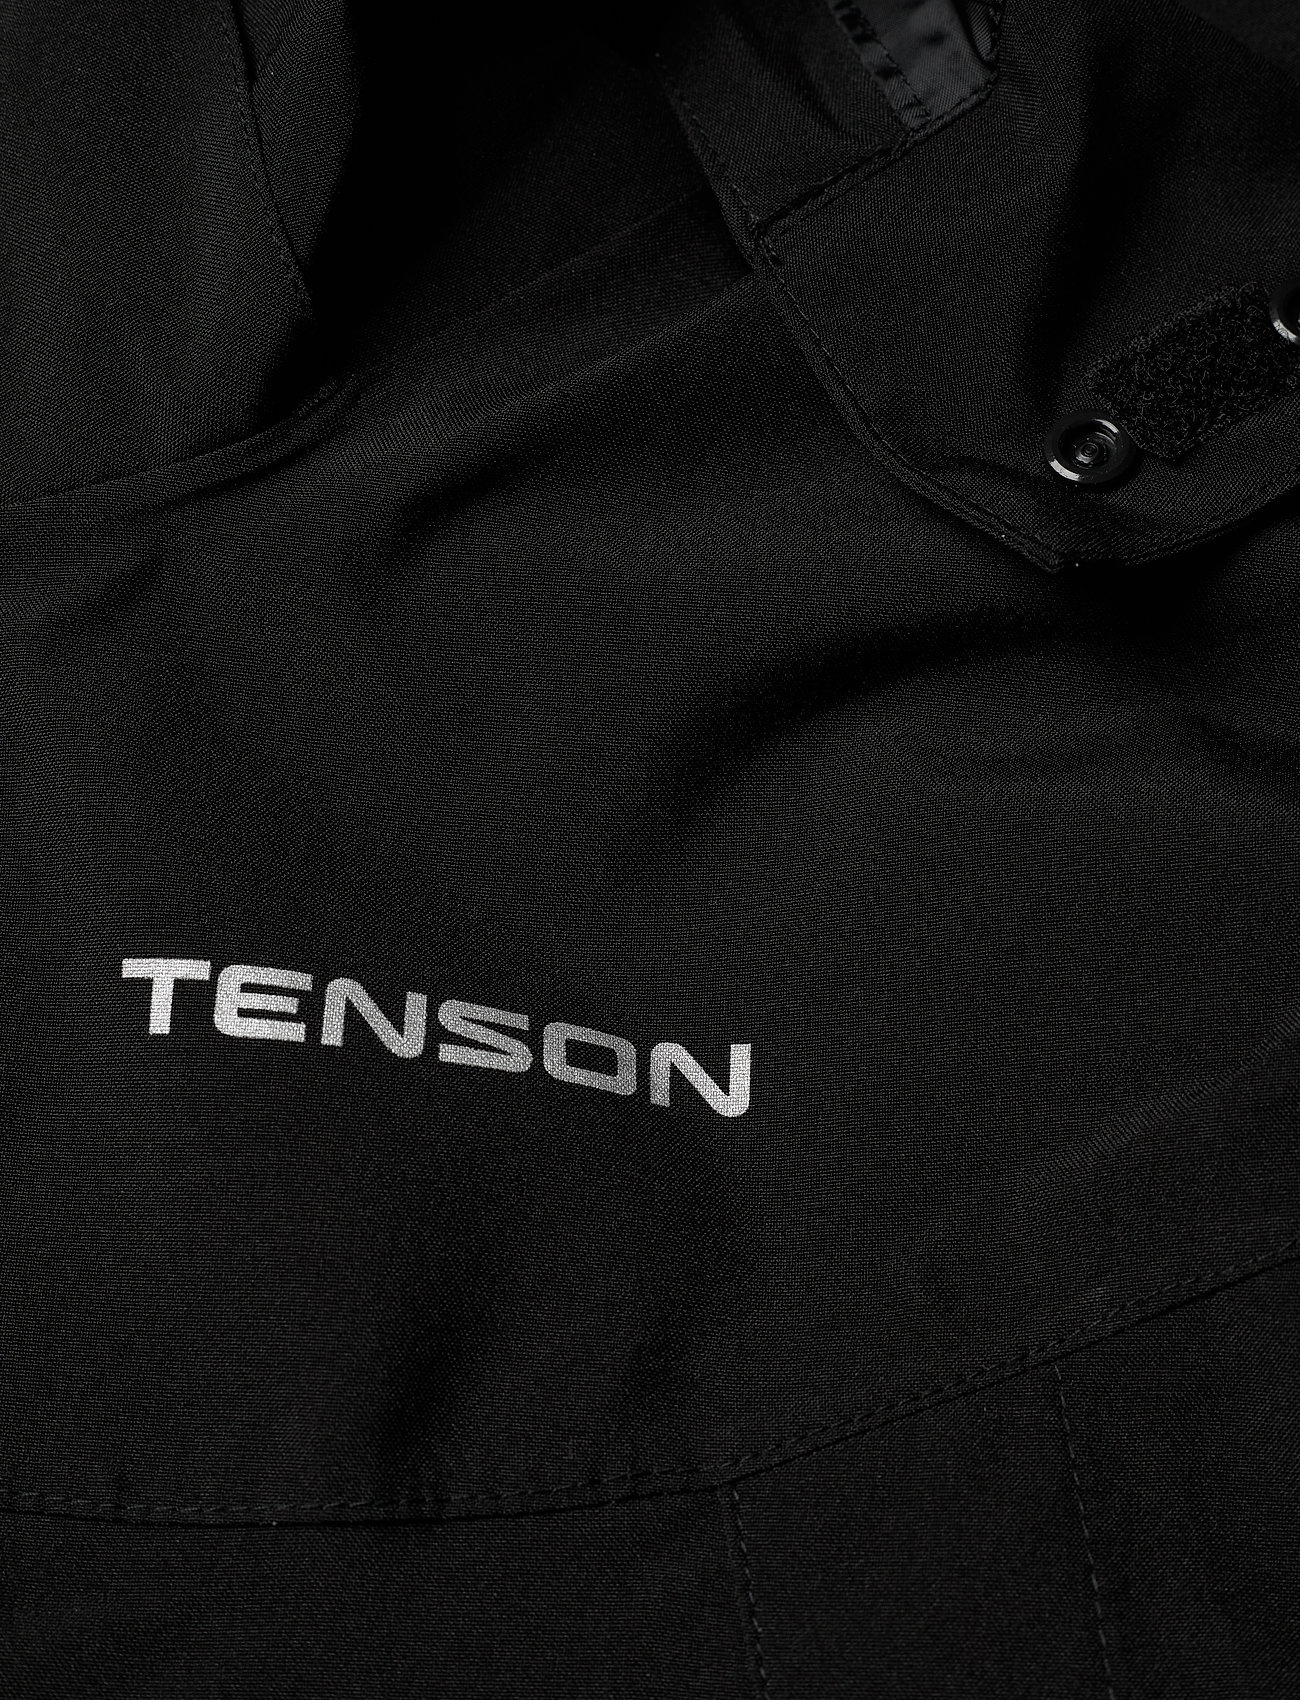 Hurricane W Set (Black) (112.50 €) - Tenson yFtlt